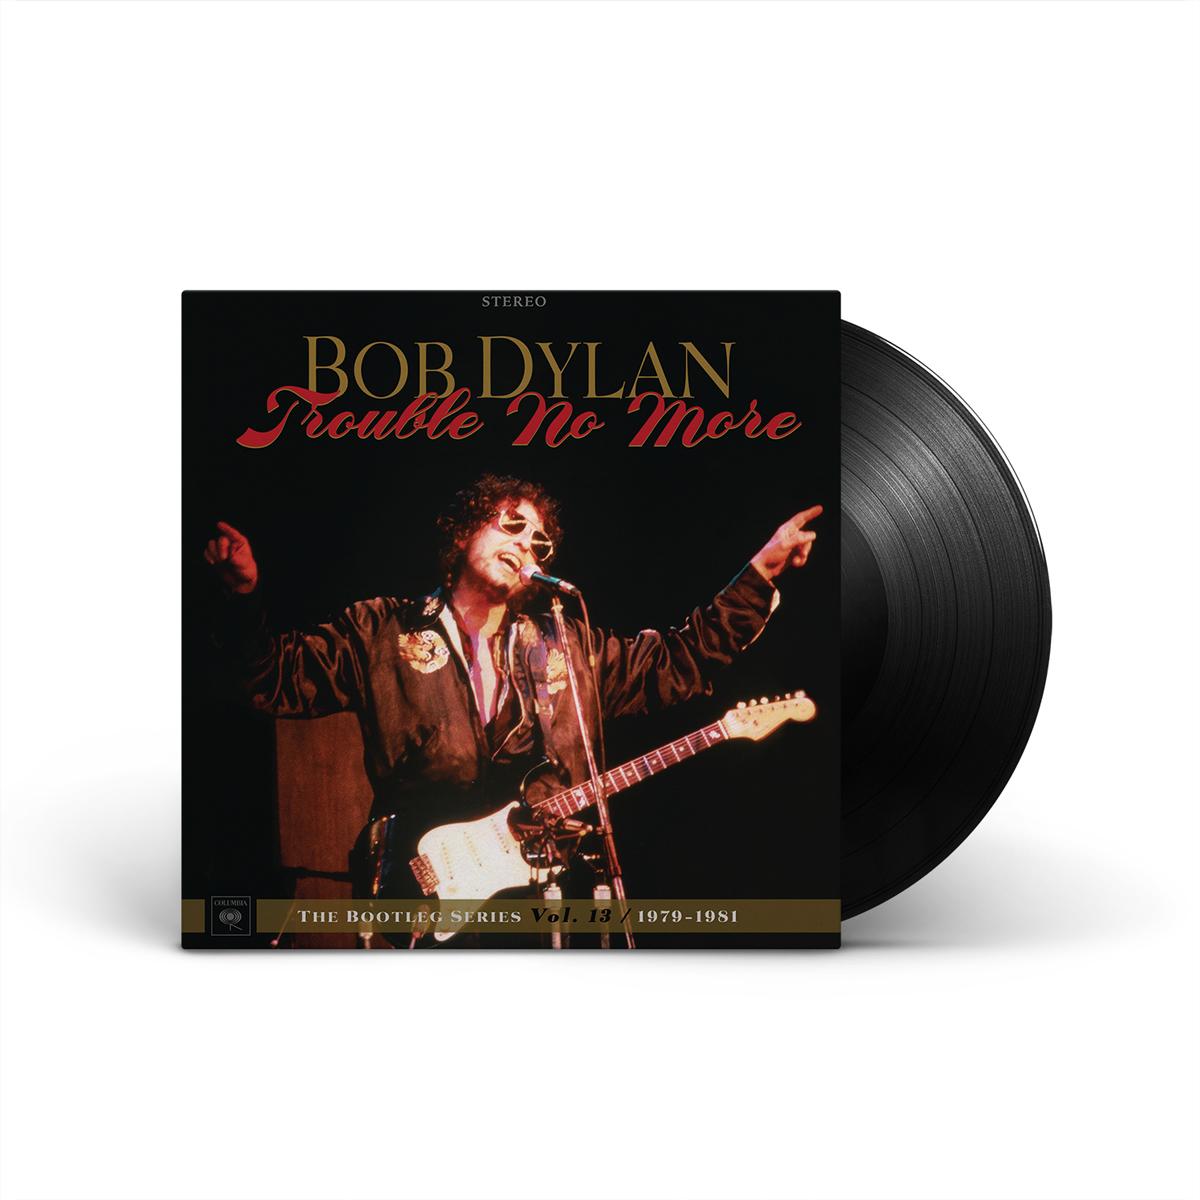 Trouble No More: The Bootleg Series Vol. 13 / 1979-1981 (4 LP Standard Box)